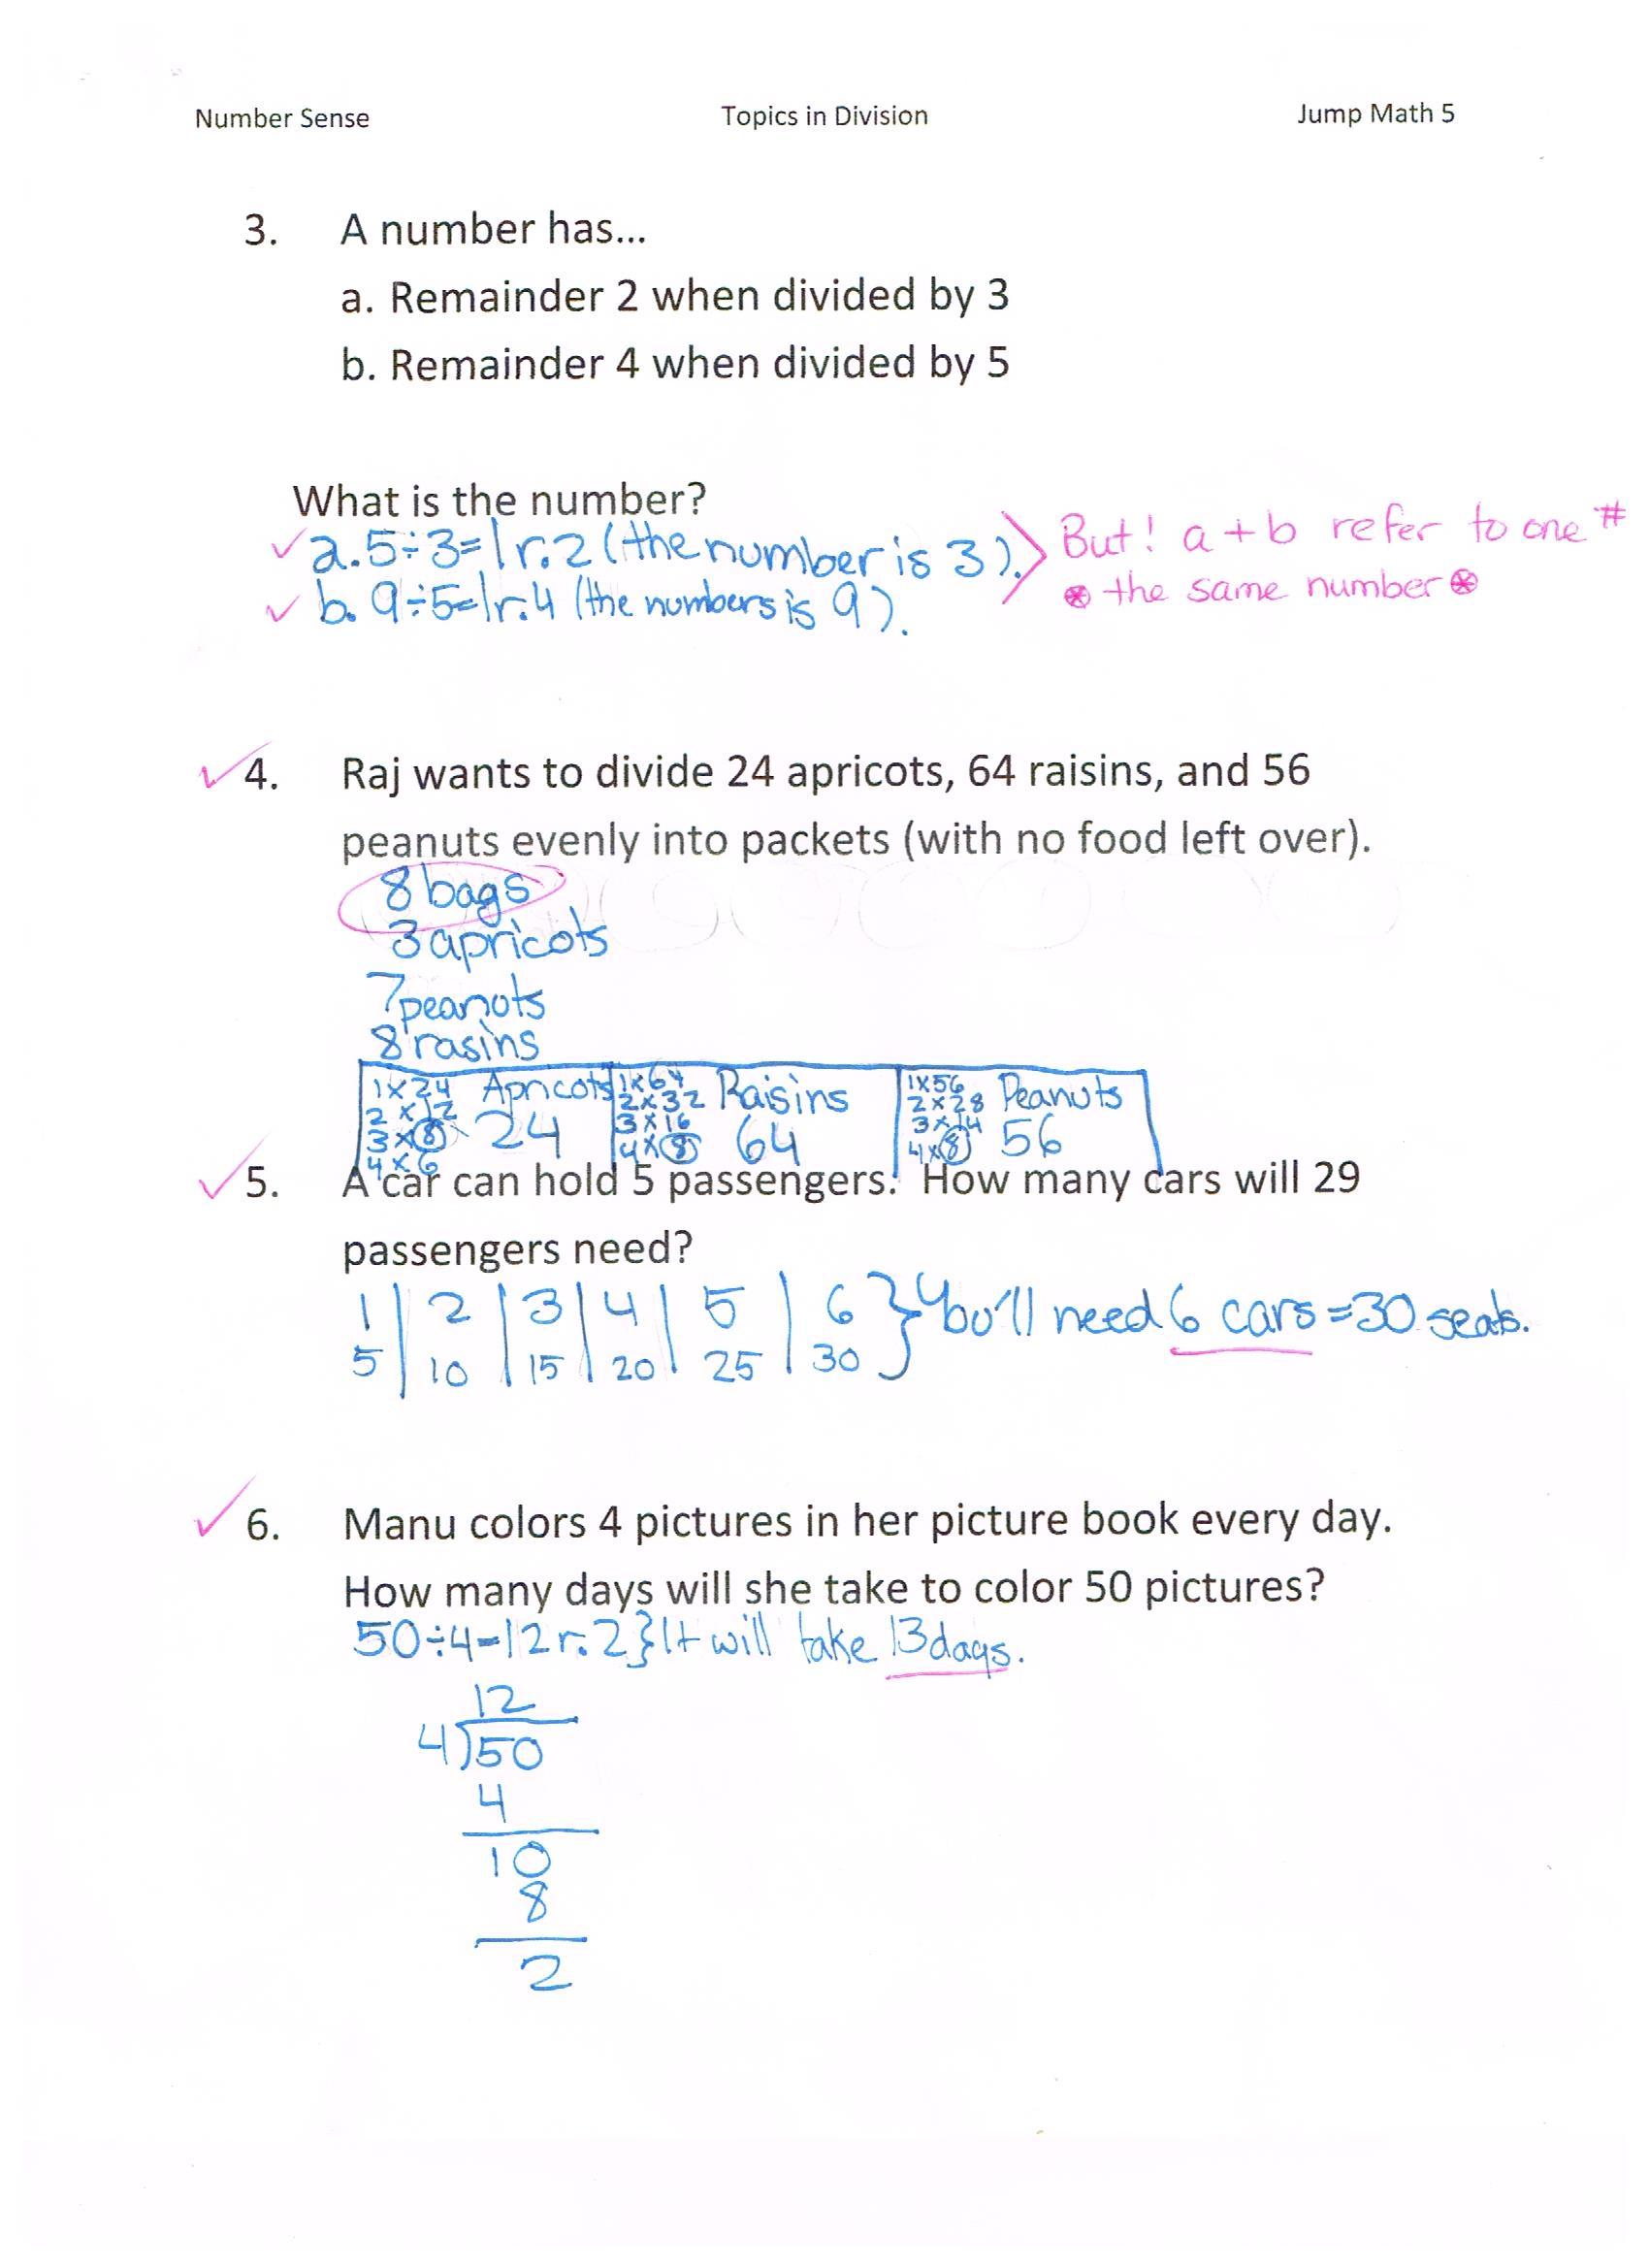 Jump Math 51 Number Sense Division Page 99 Jessicas School